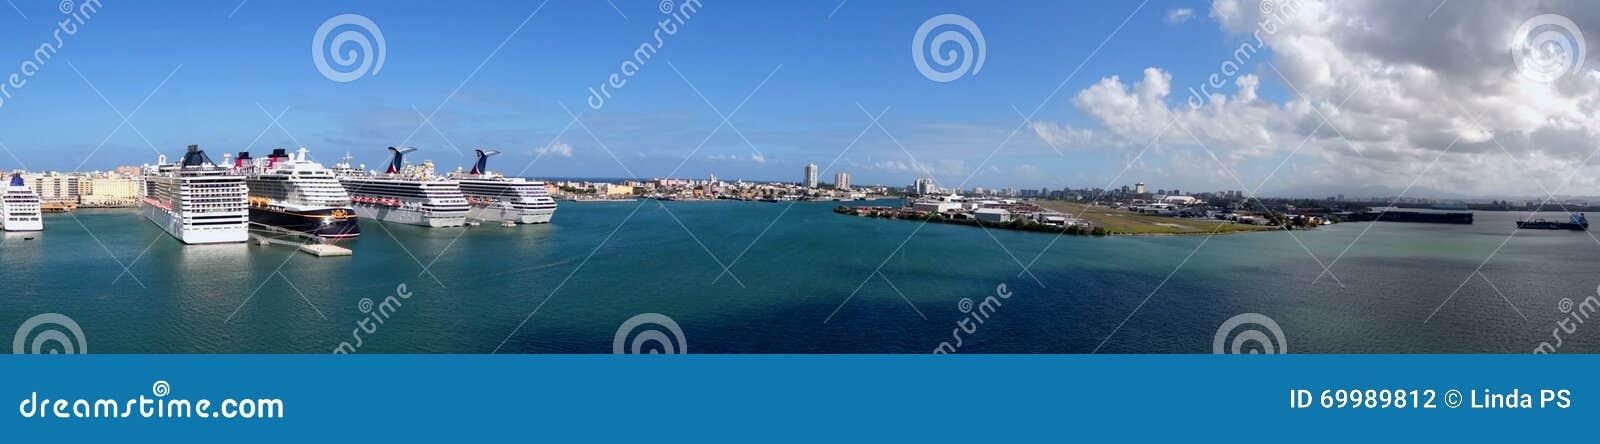 Panorama Cruiseport San Juan - Puerto Rico